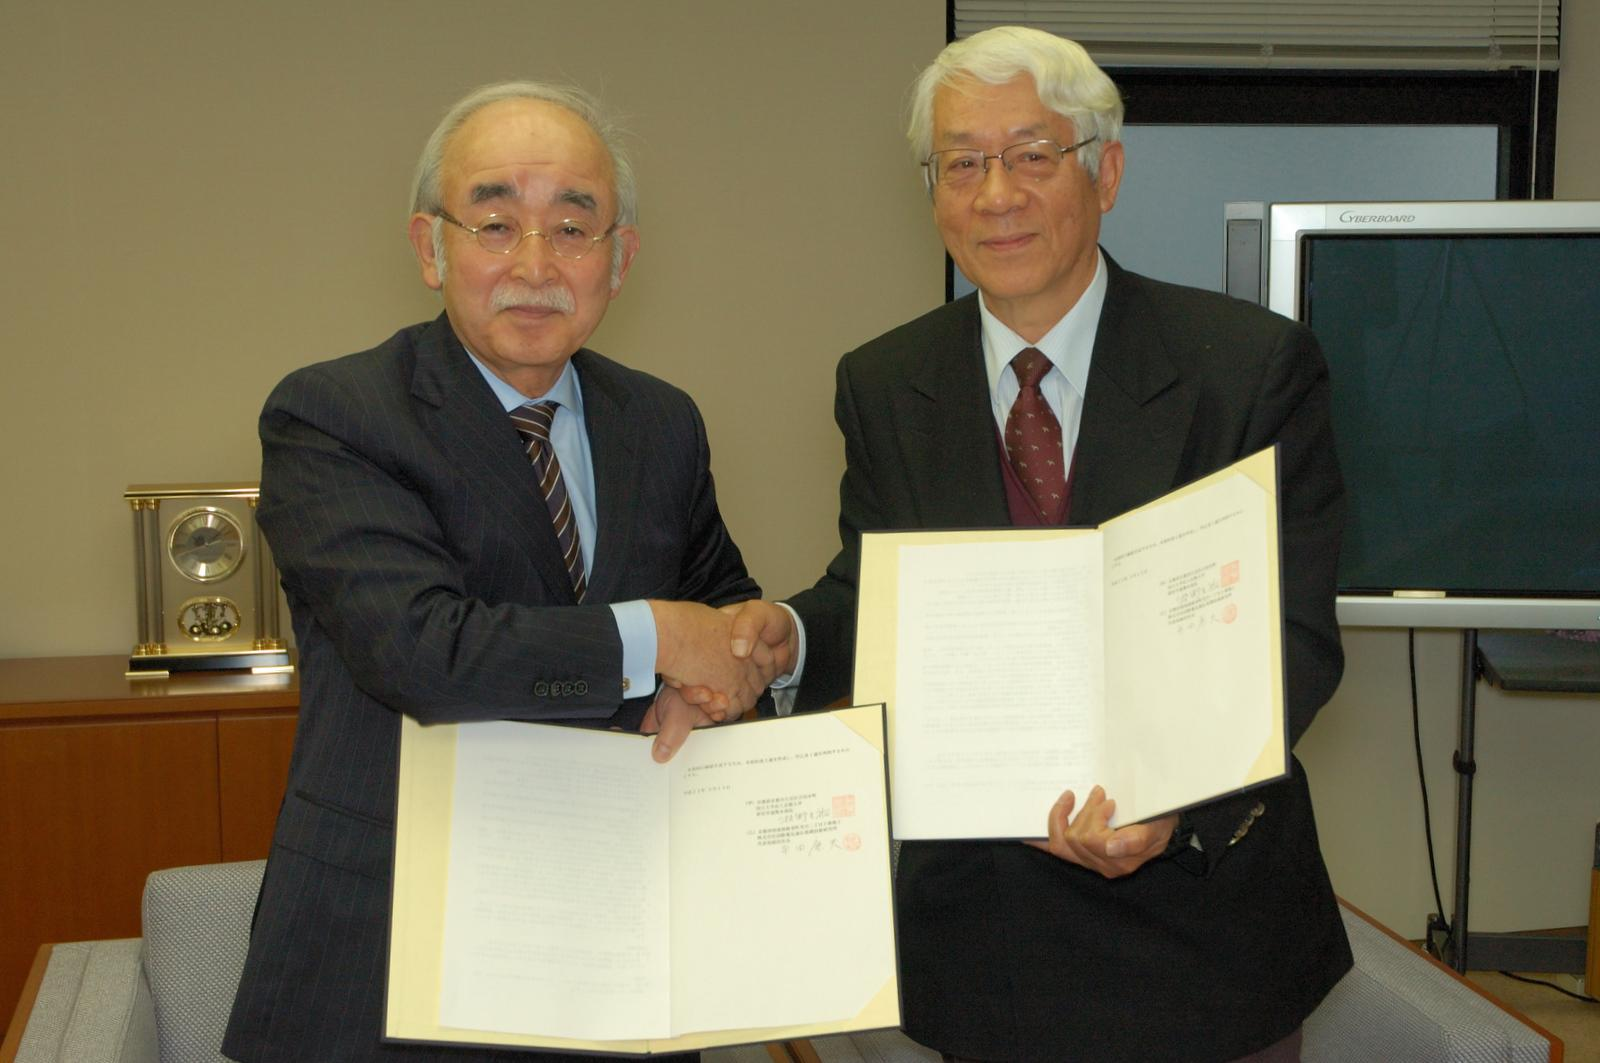 ATRの平田康夫代表取締役社長(右)と京都大学産官学連携本部の牧野圭祐本部長